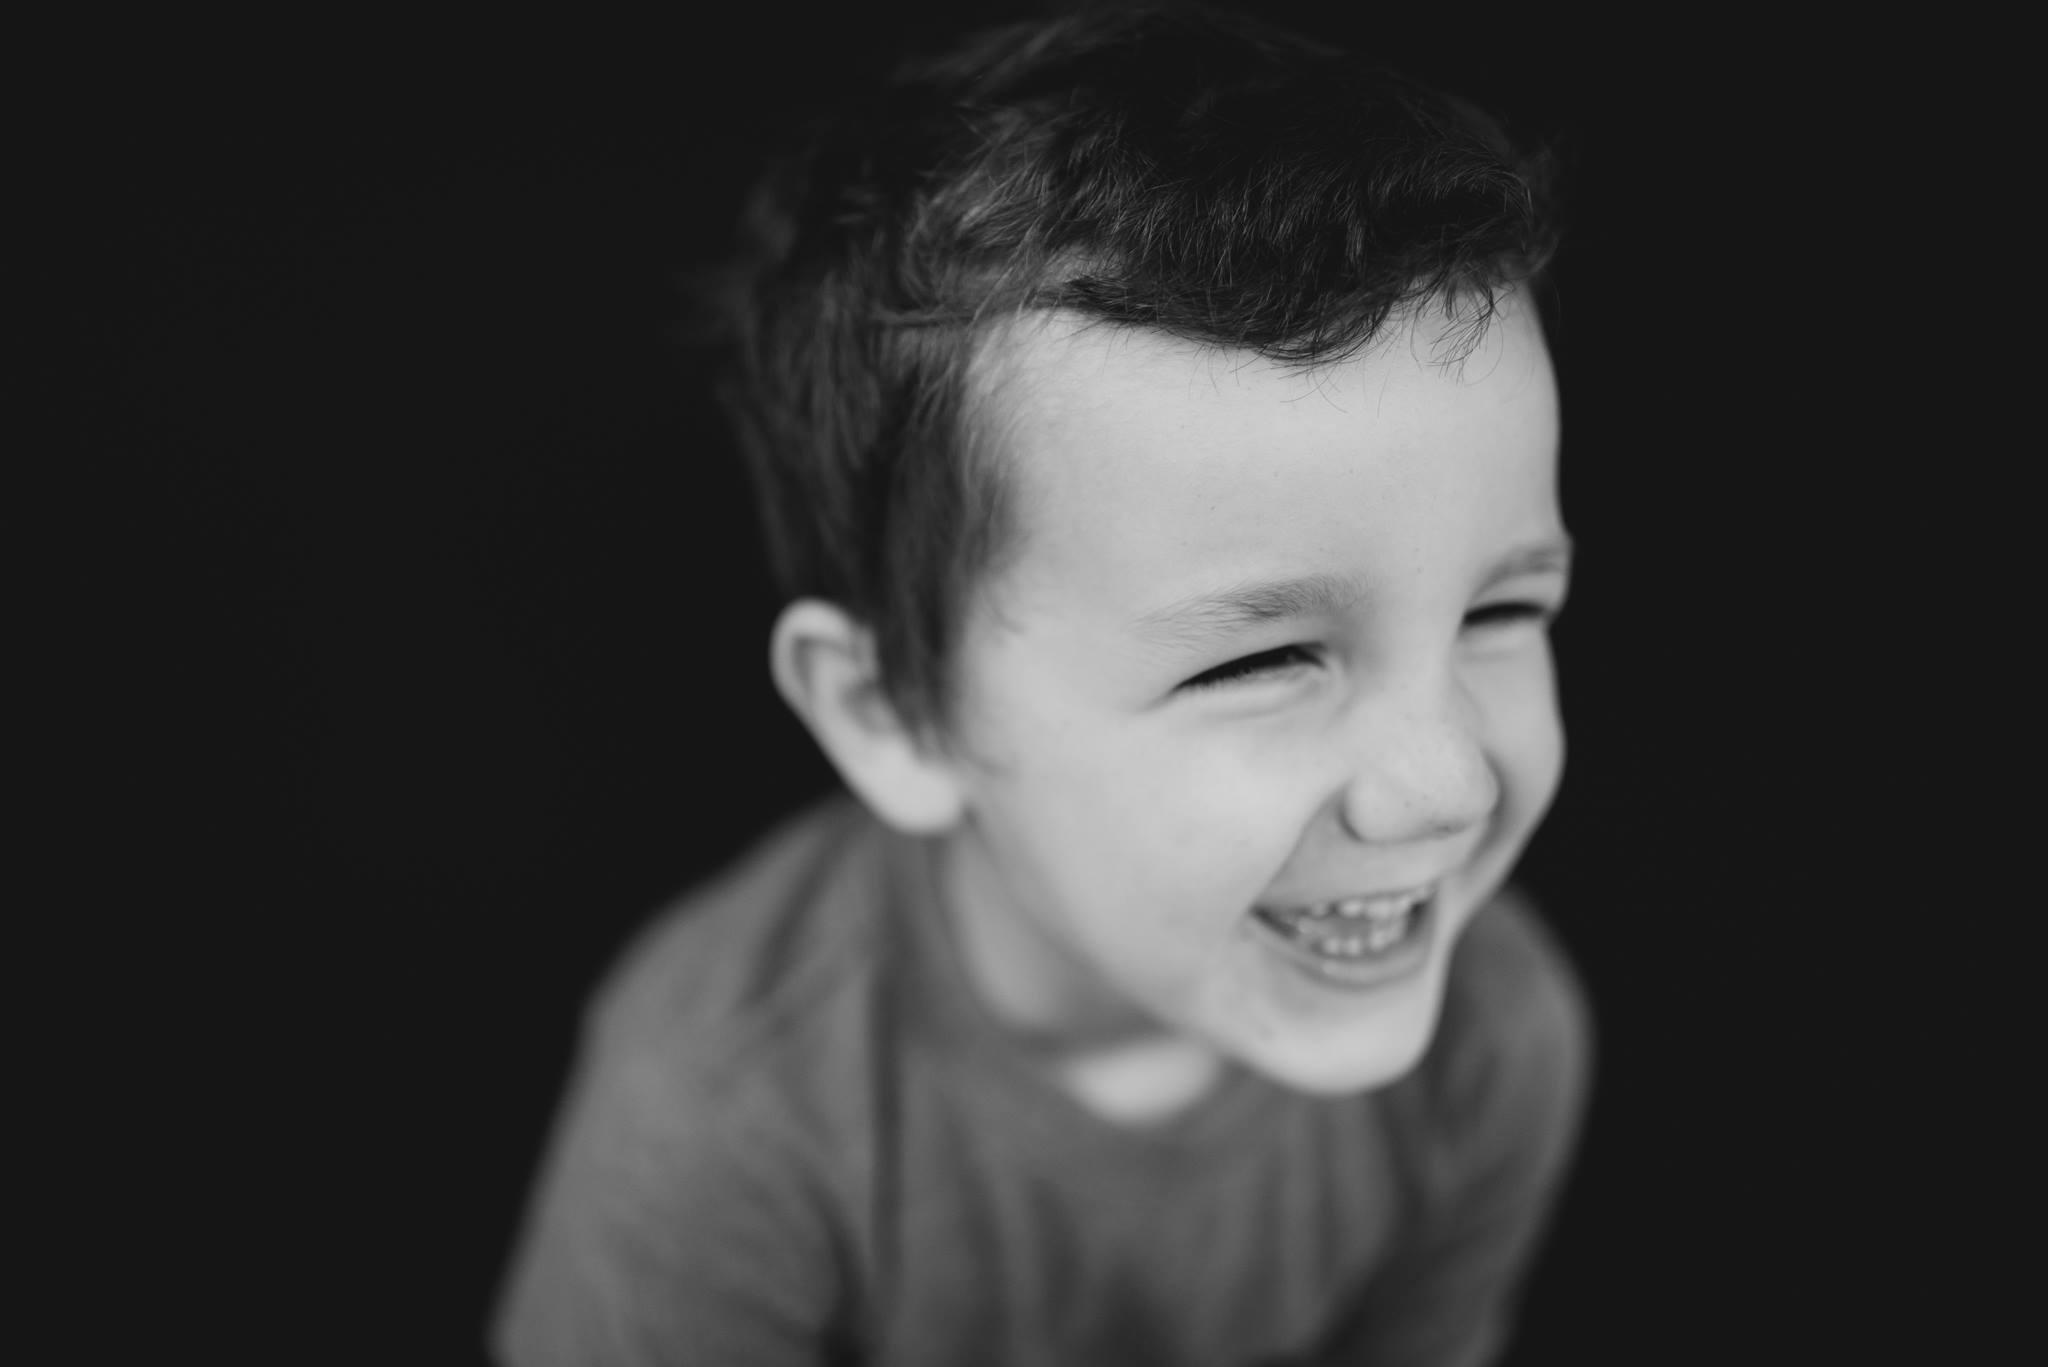 black and white fine art school child portrait photography class meg miller